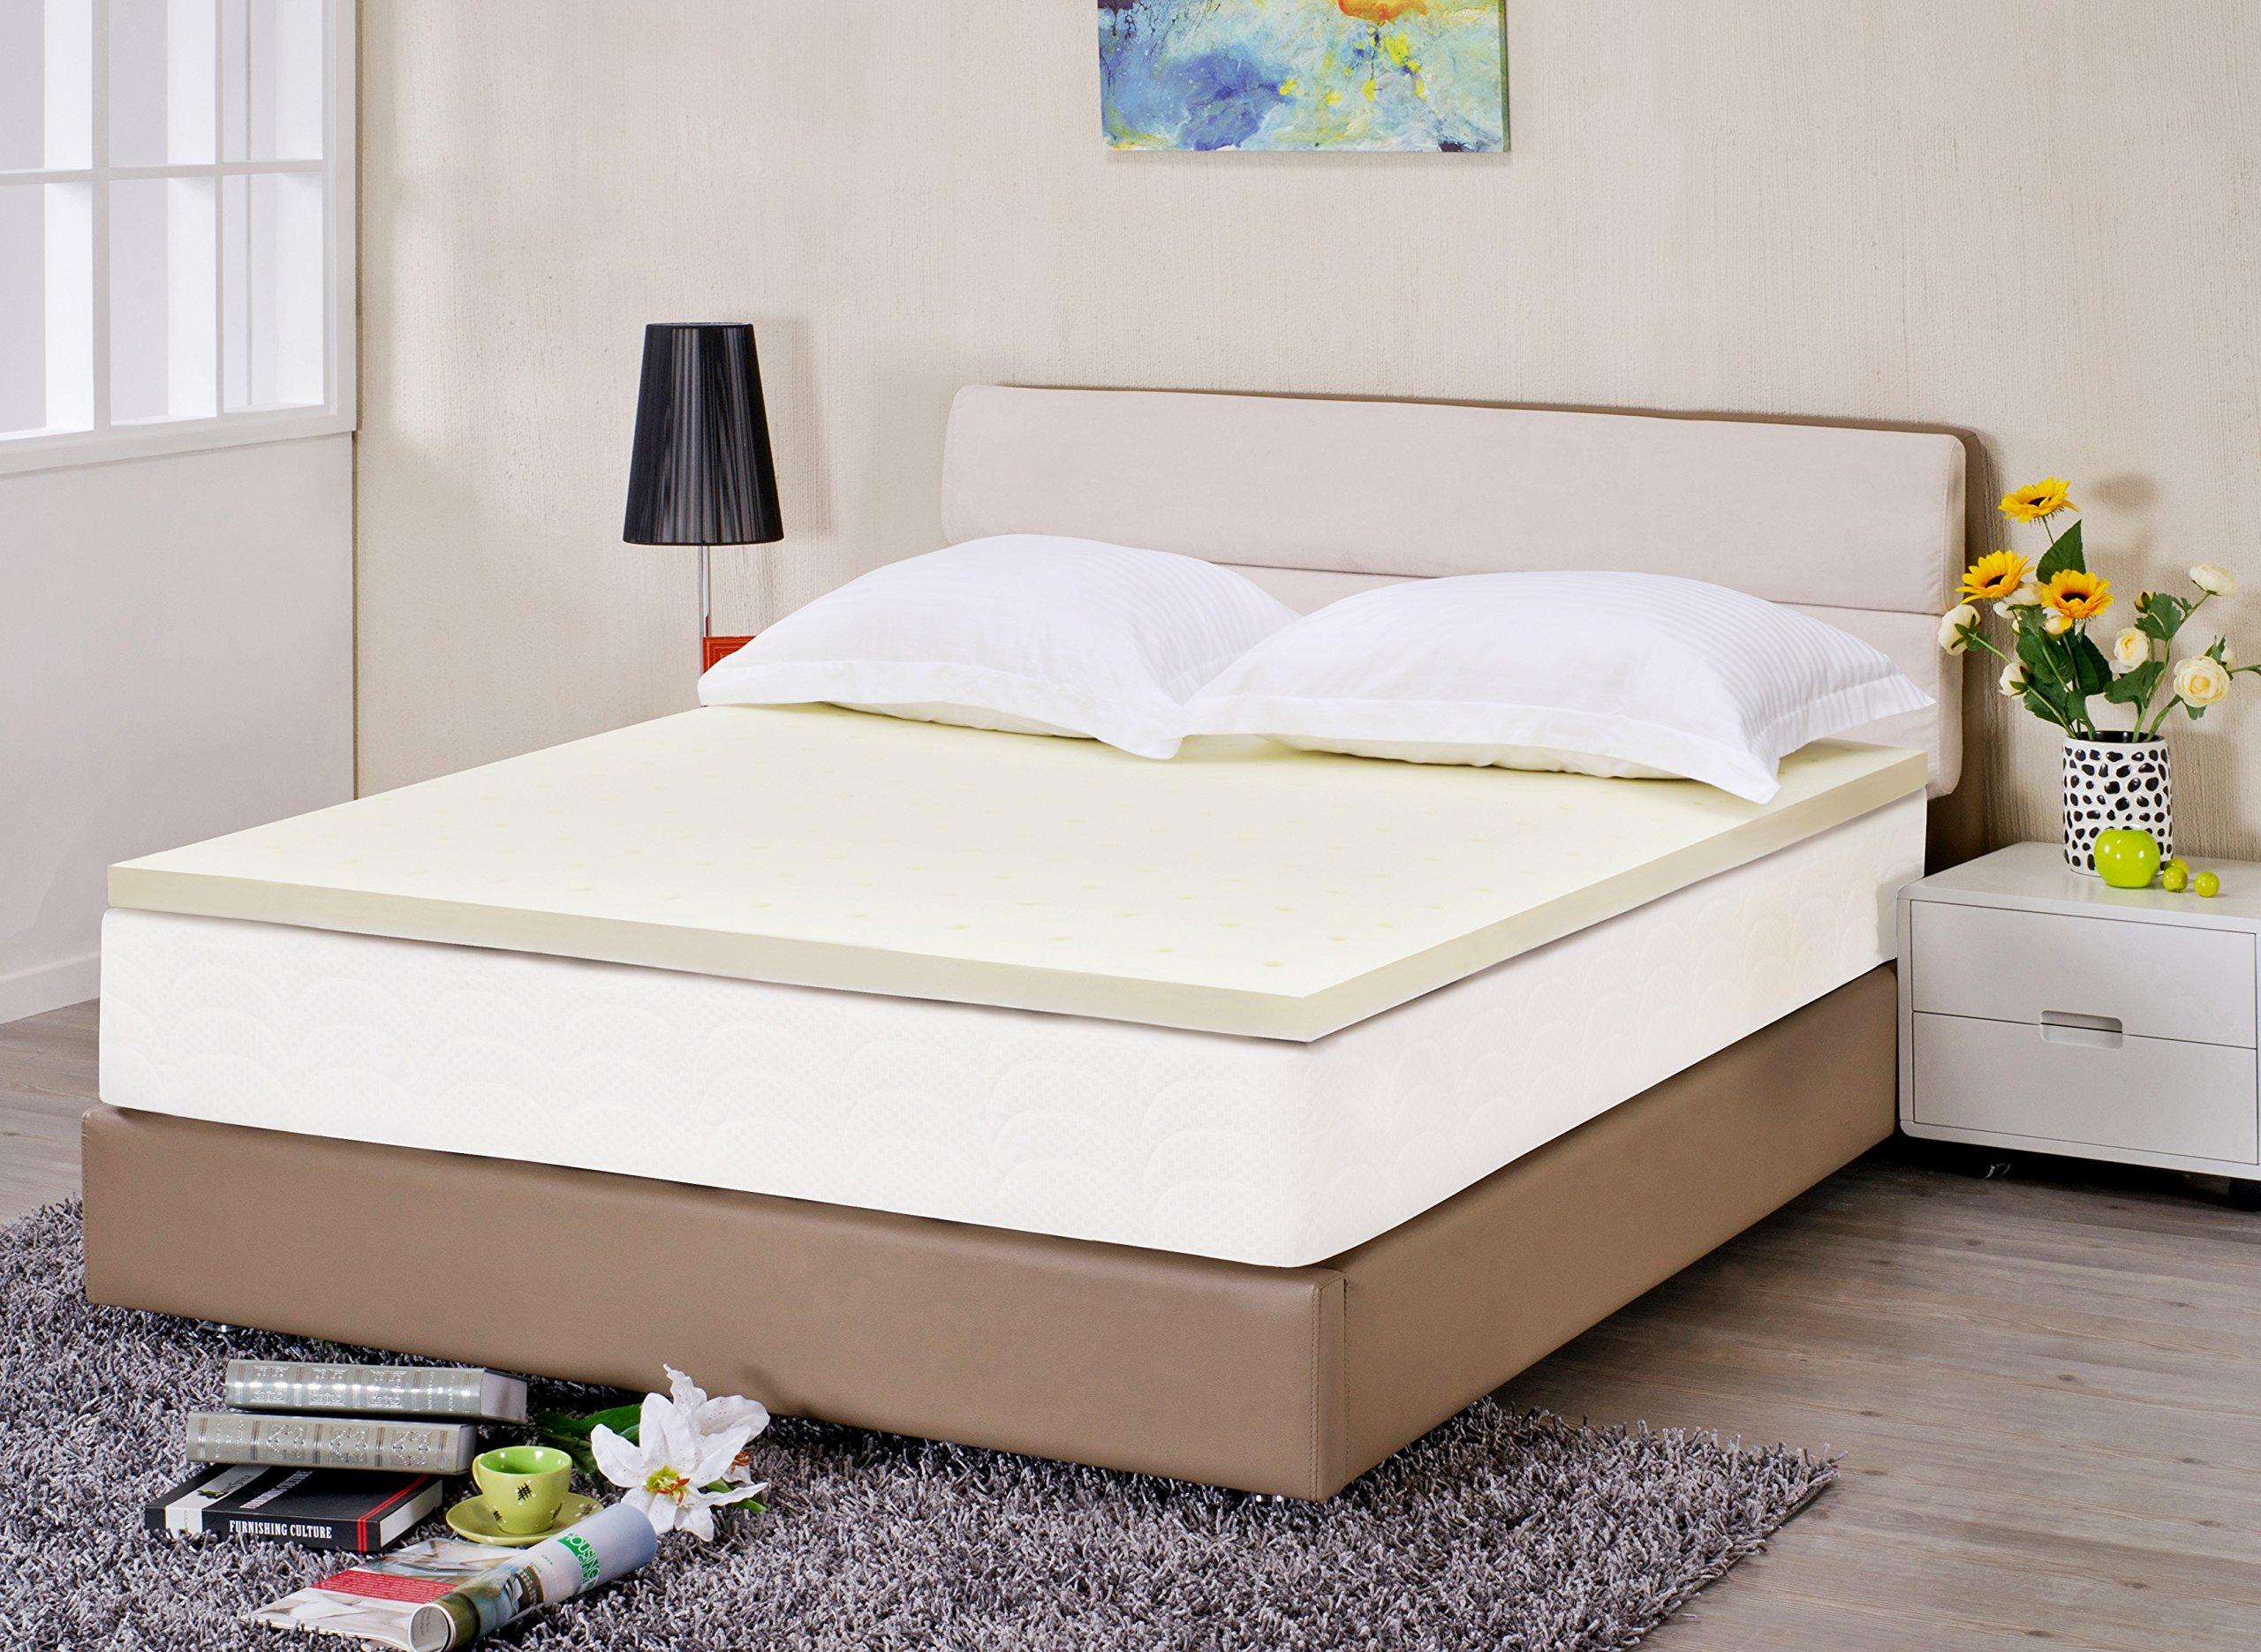 Superior 2'' Ventilated Memory Foam Mattress Topper, High Density Premium Visco Elastic Memory Foam for Neck & Back Support - California King Bed